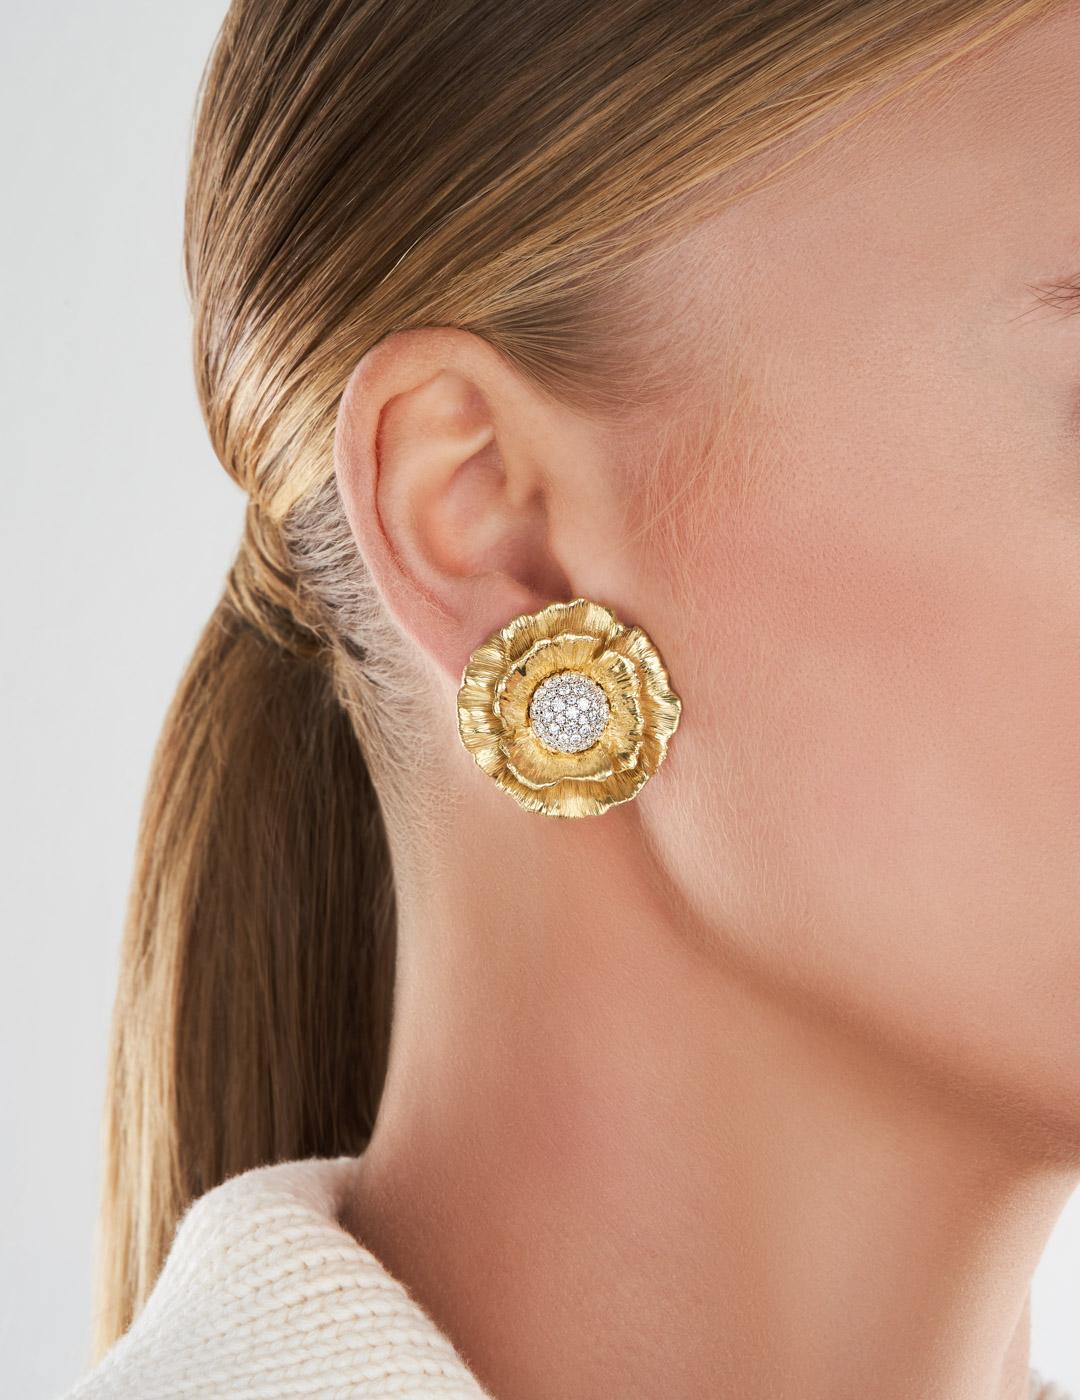 mish_products_earrings_Poppy EC-YG-ER-3